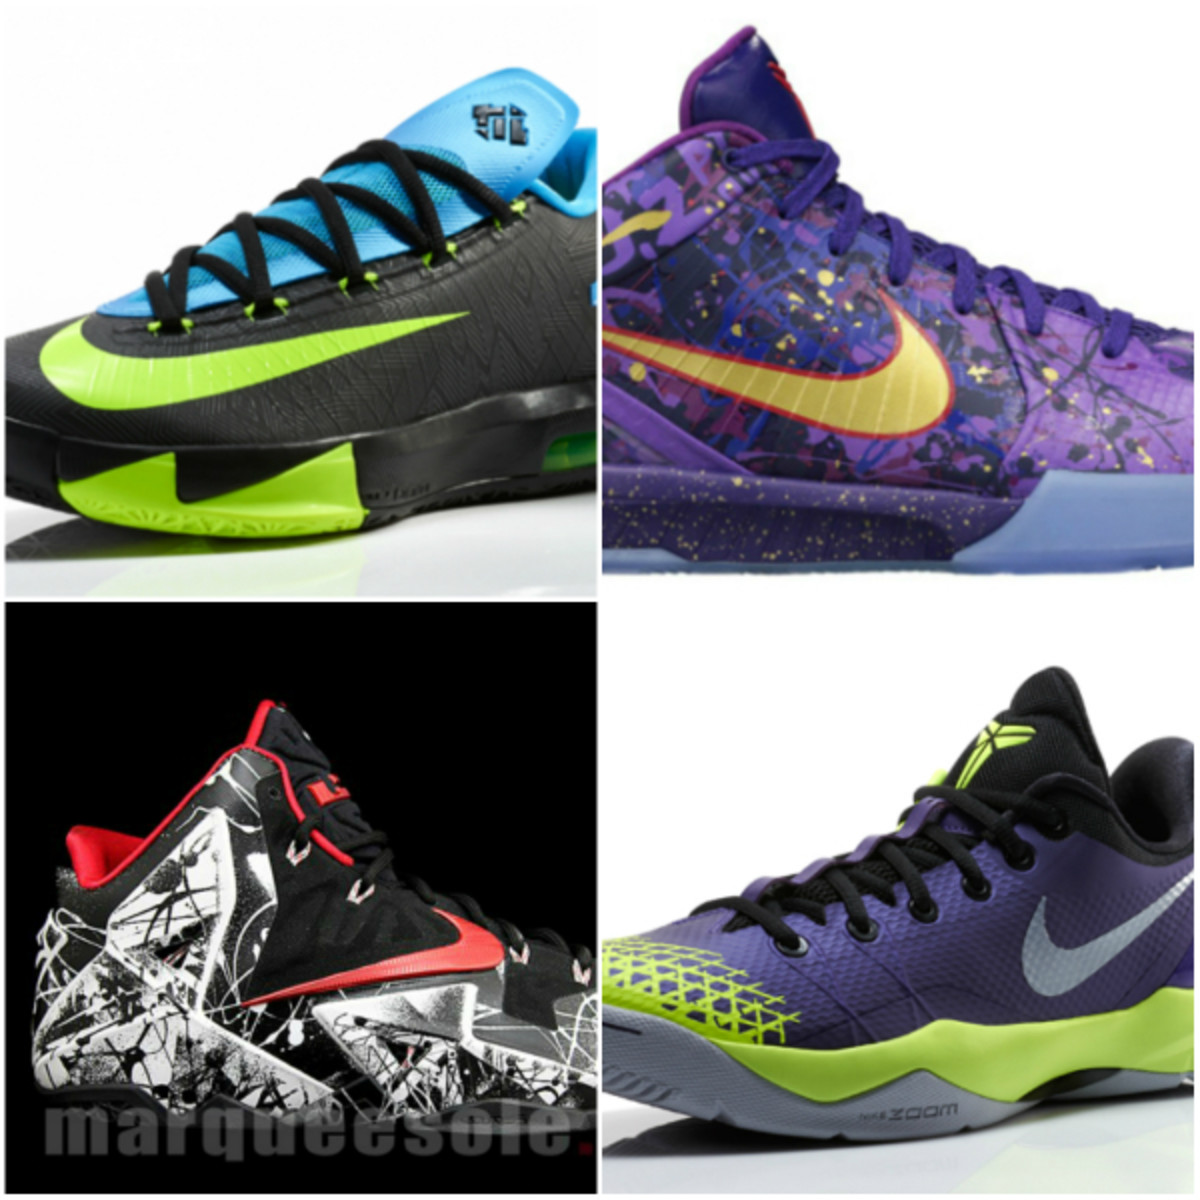 Nike Basketball January 2014 Release Dates